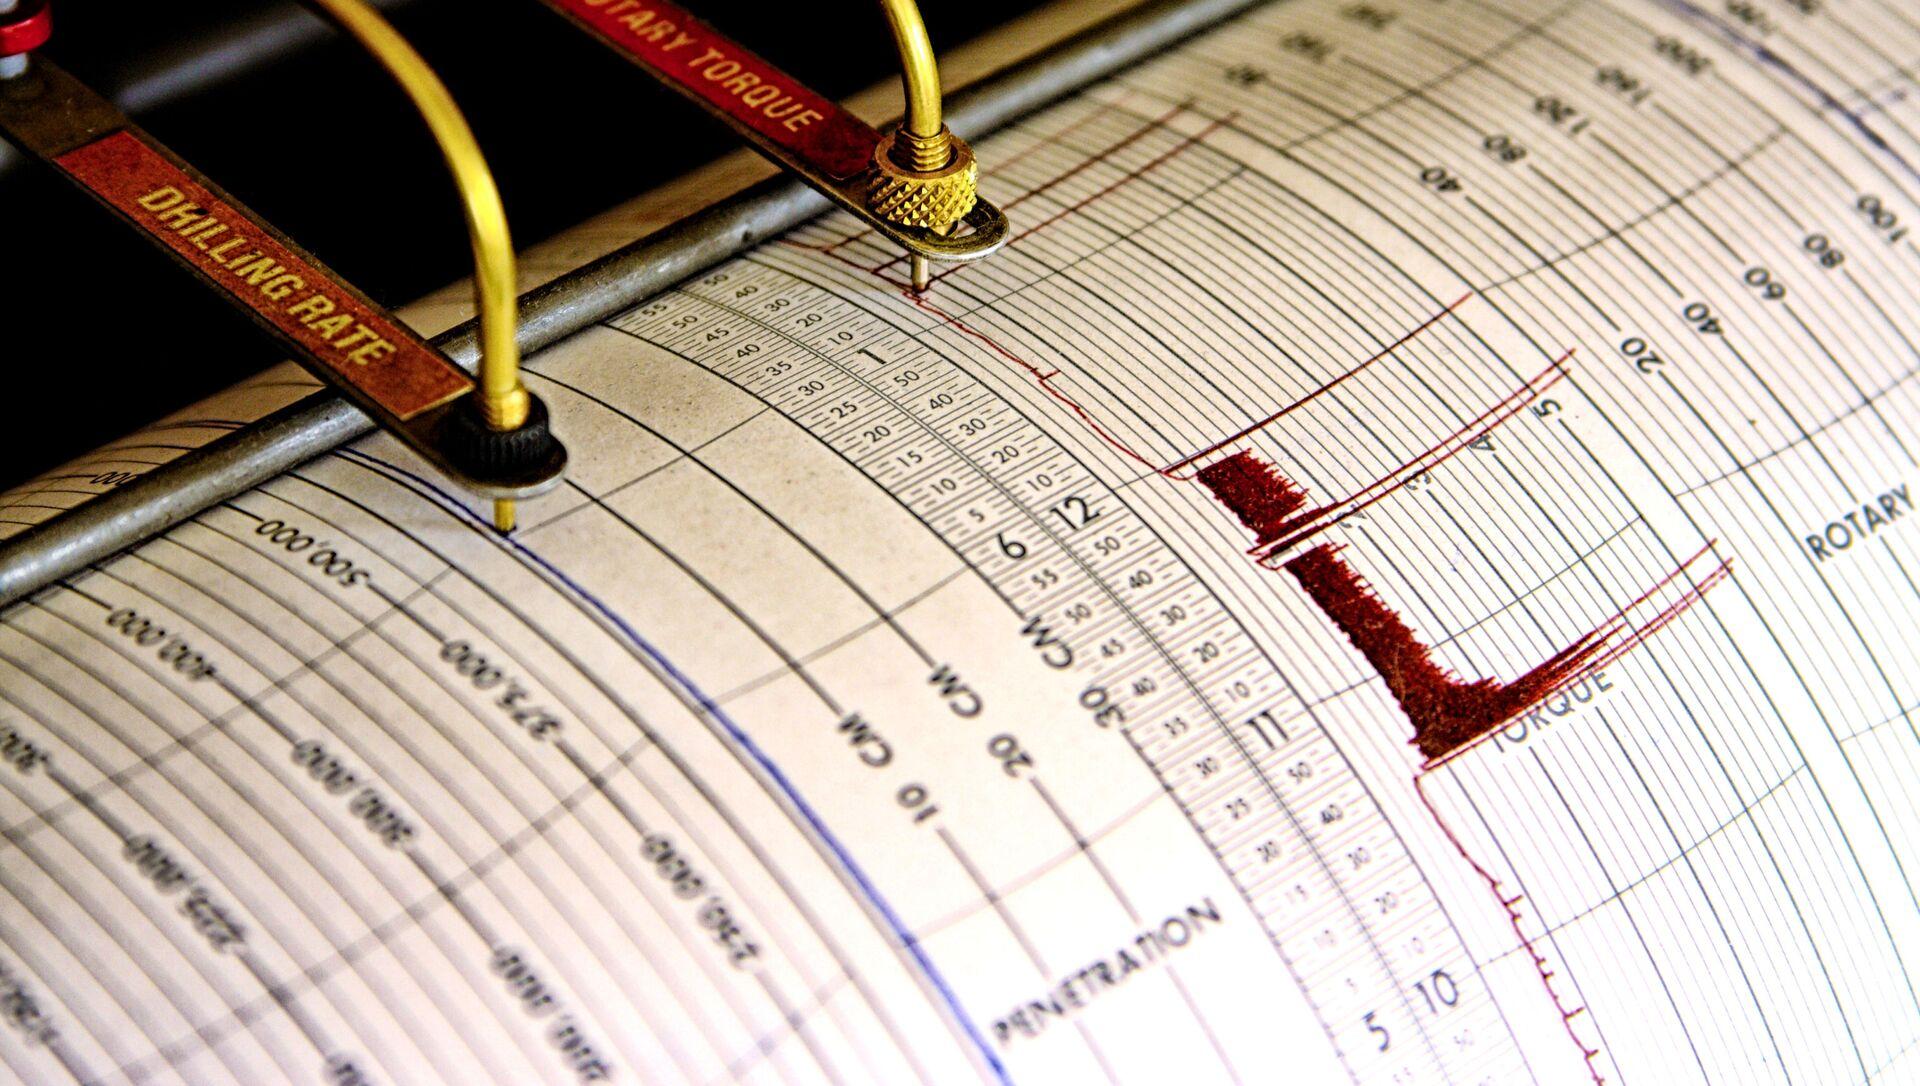 Sismografo di terremoto - Sputnik Italia, 1920, 10.04.2021